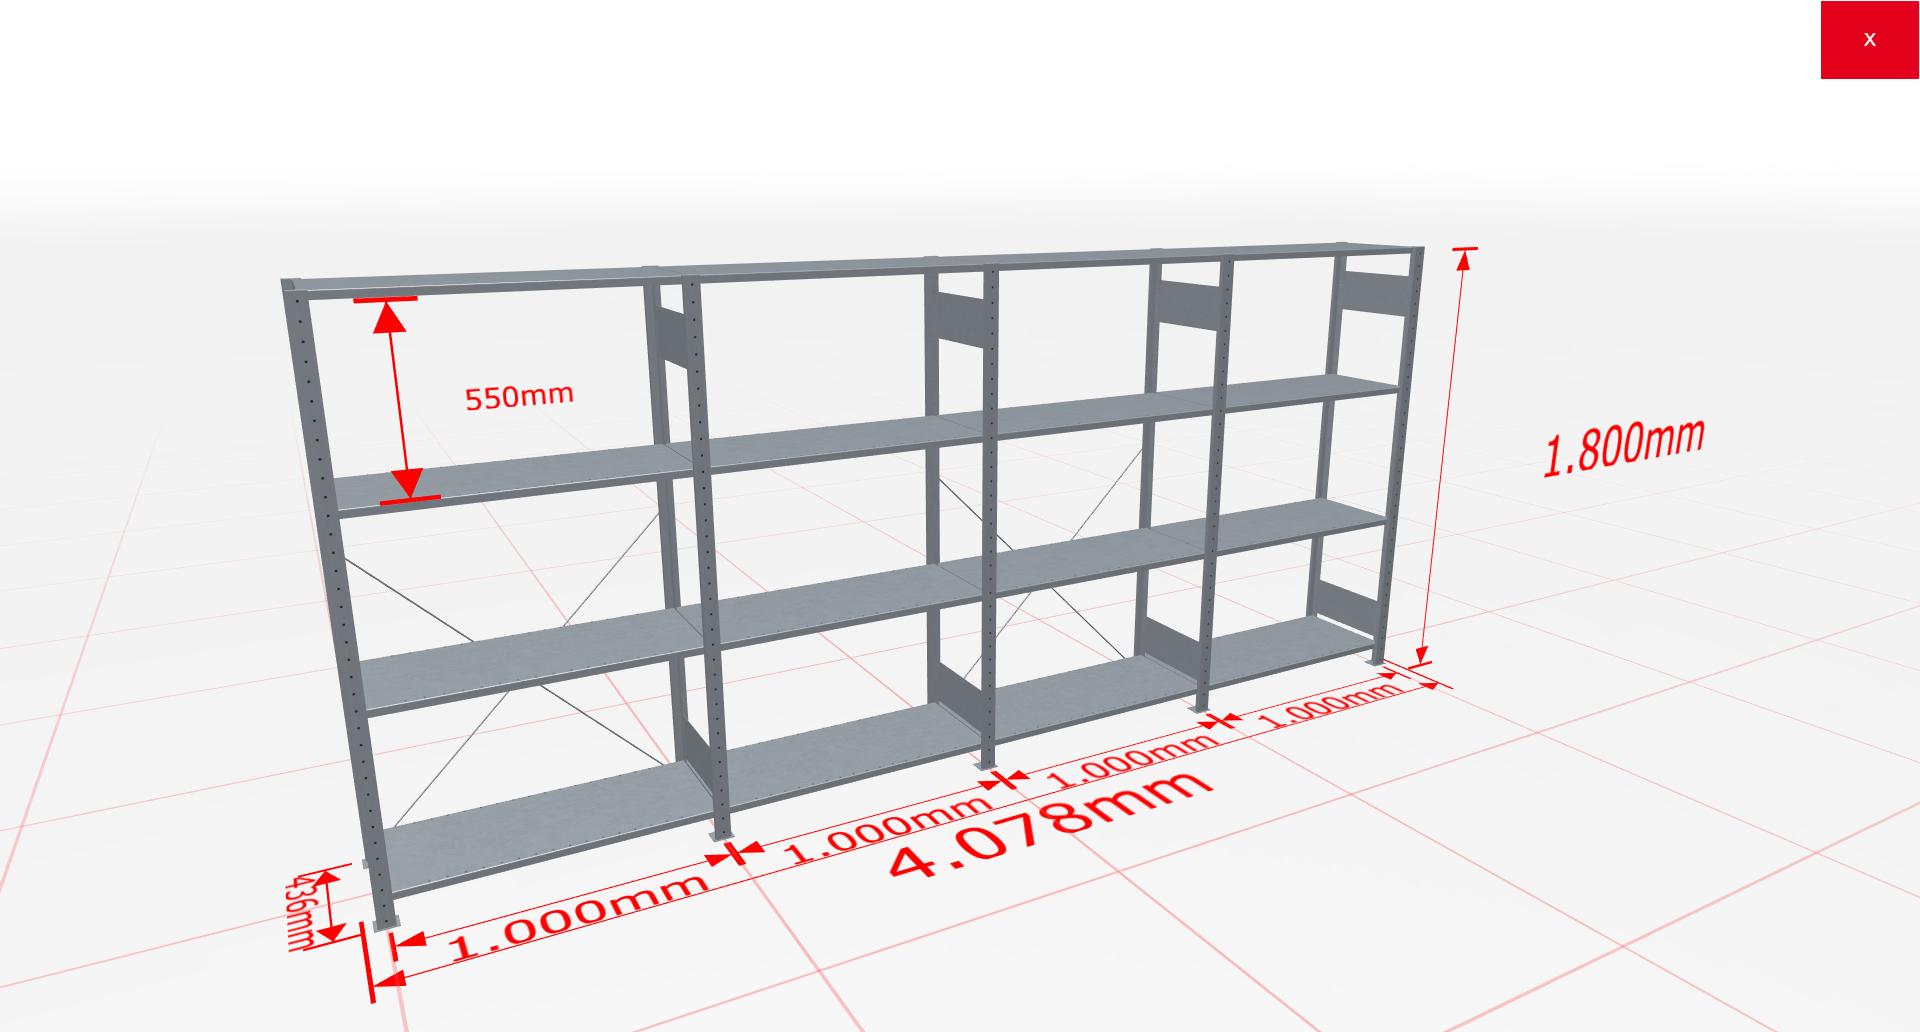 Fachbodenregal Komplettregal 1800x4078x400 mm (HxBxT) SCHULTE Lagertechnik verzinkt 4 Ebenen  150 kg je Boden